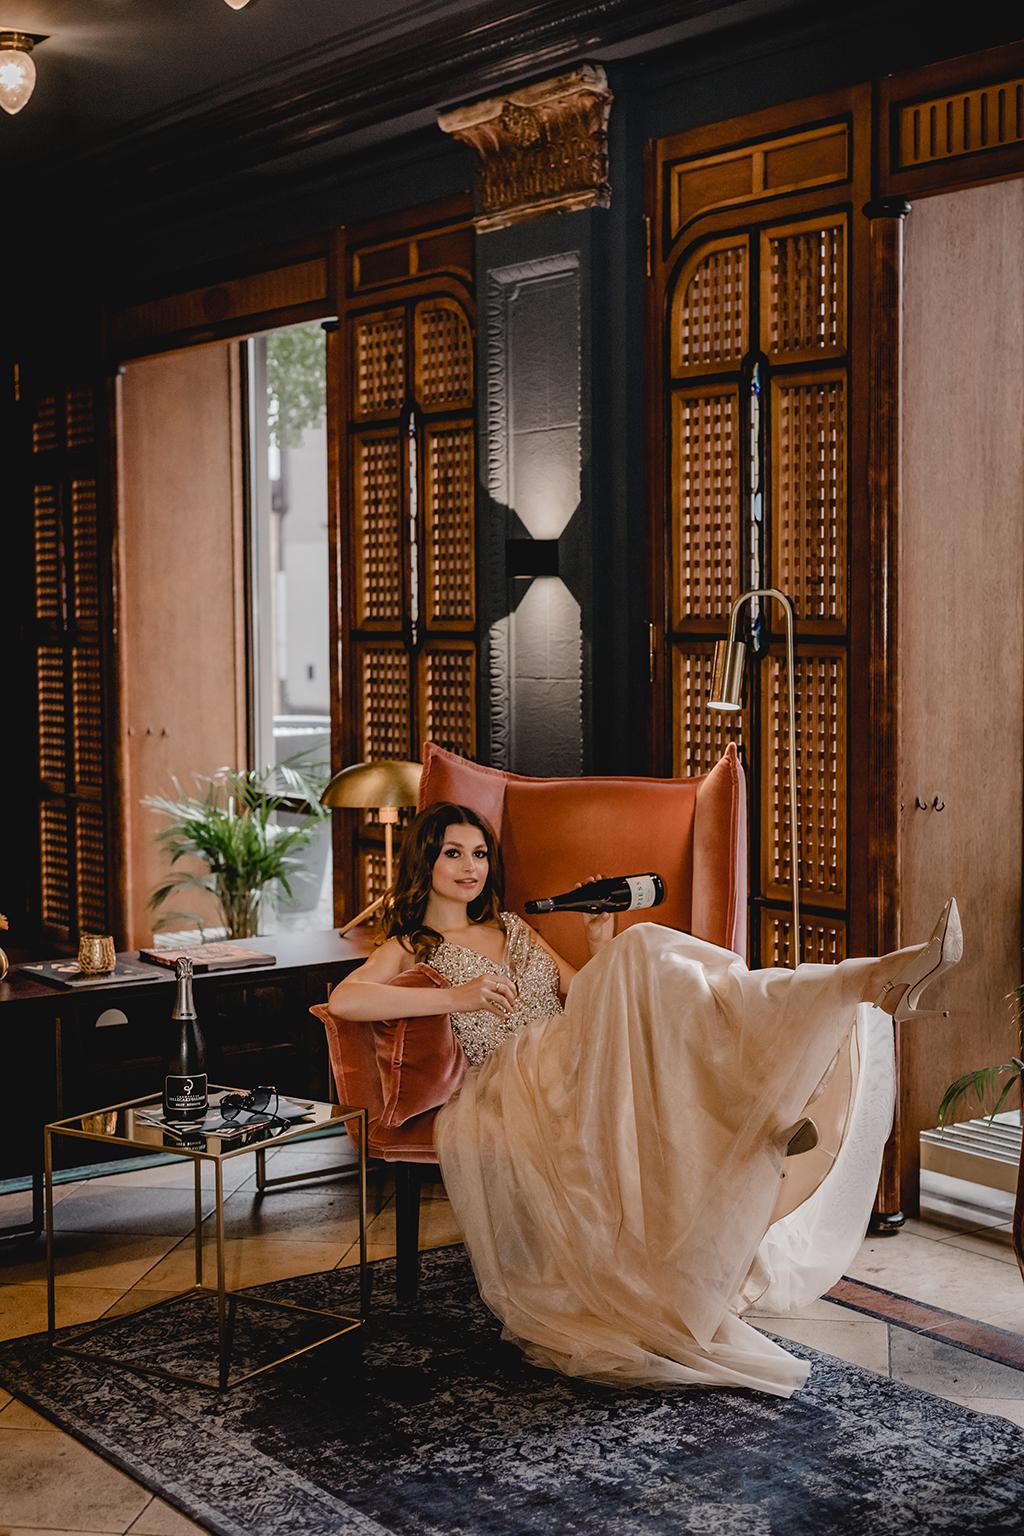 Brautkleid mit Glitzer und Tüll - Feelings Braut & Festmode